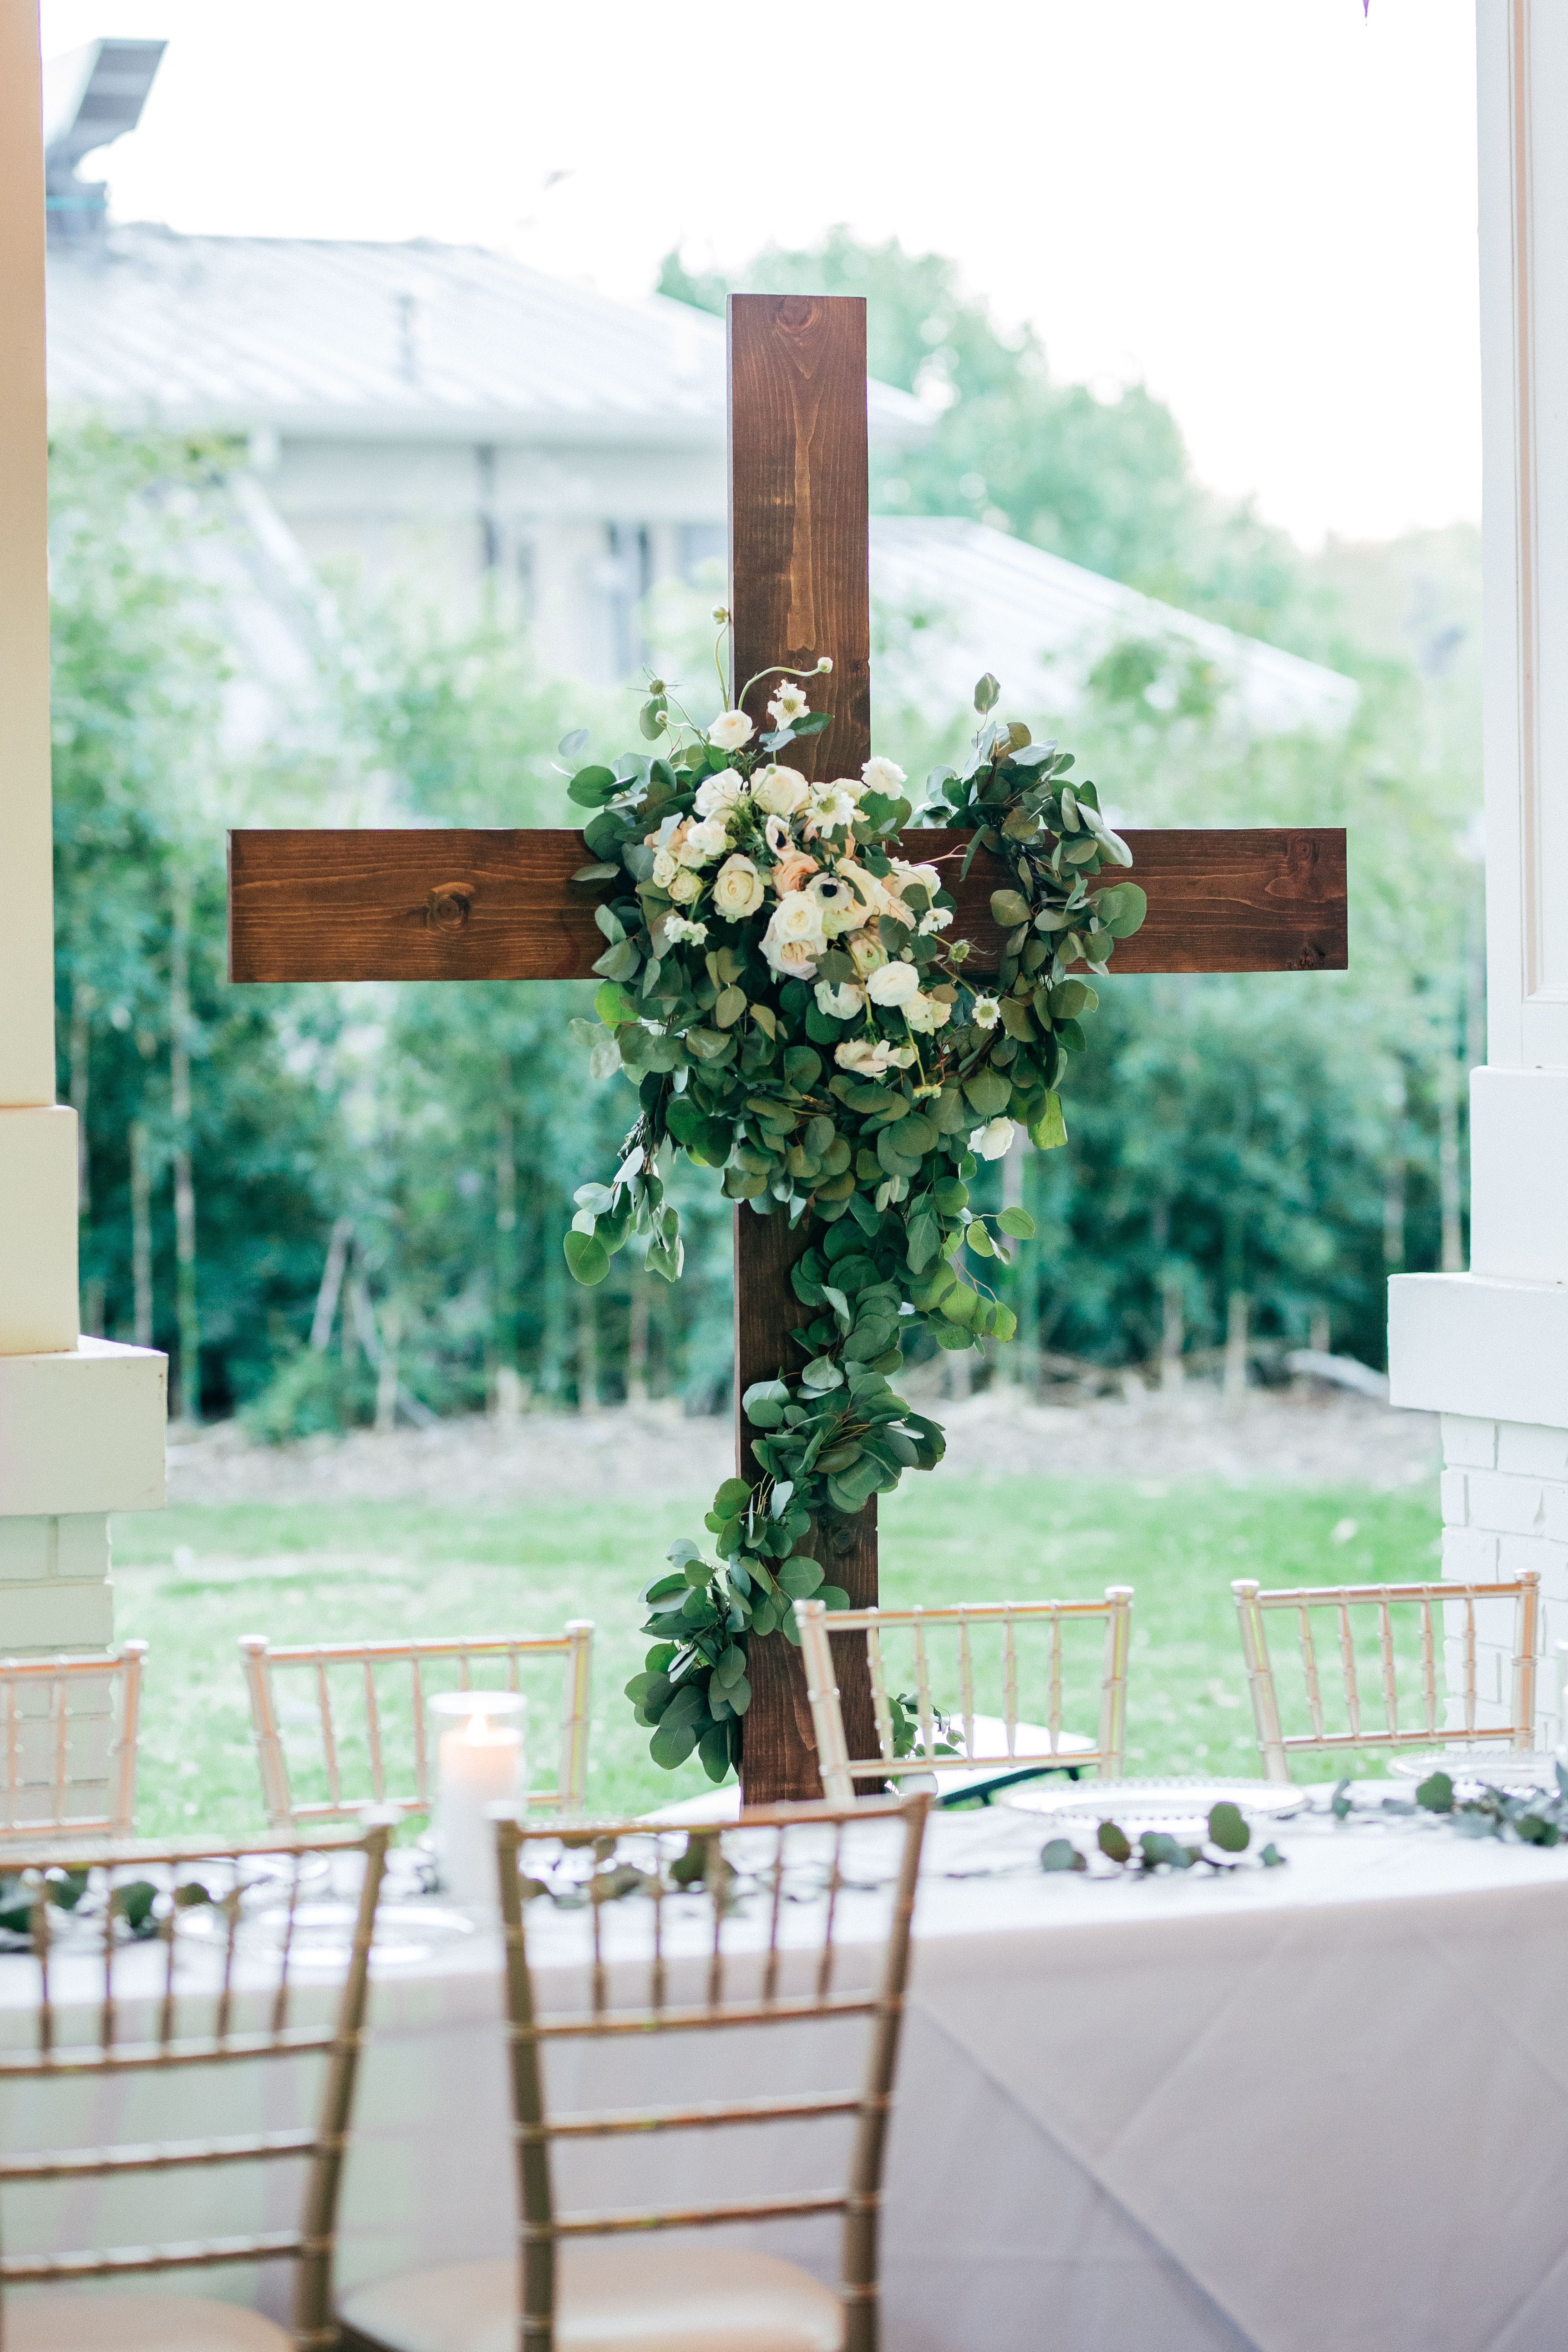 Wooden Cross Wedding Decorations Wooden Cross Dream Wedding